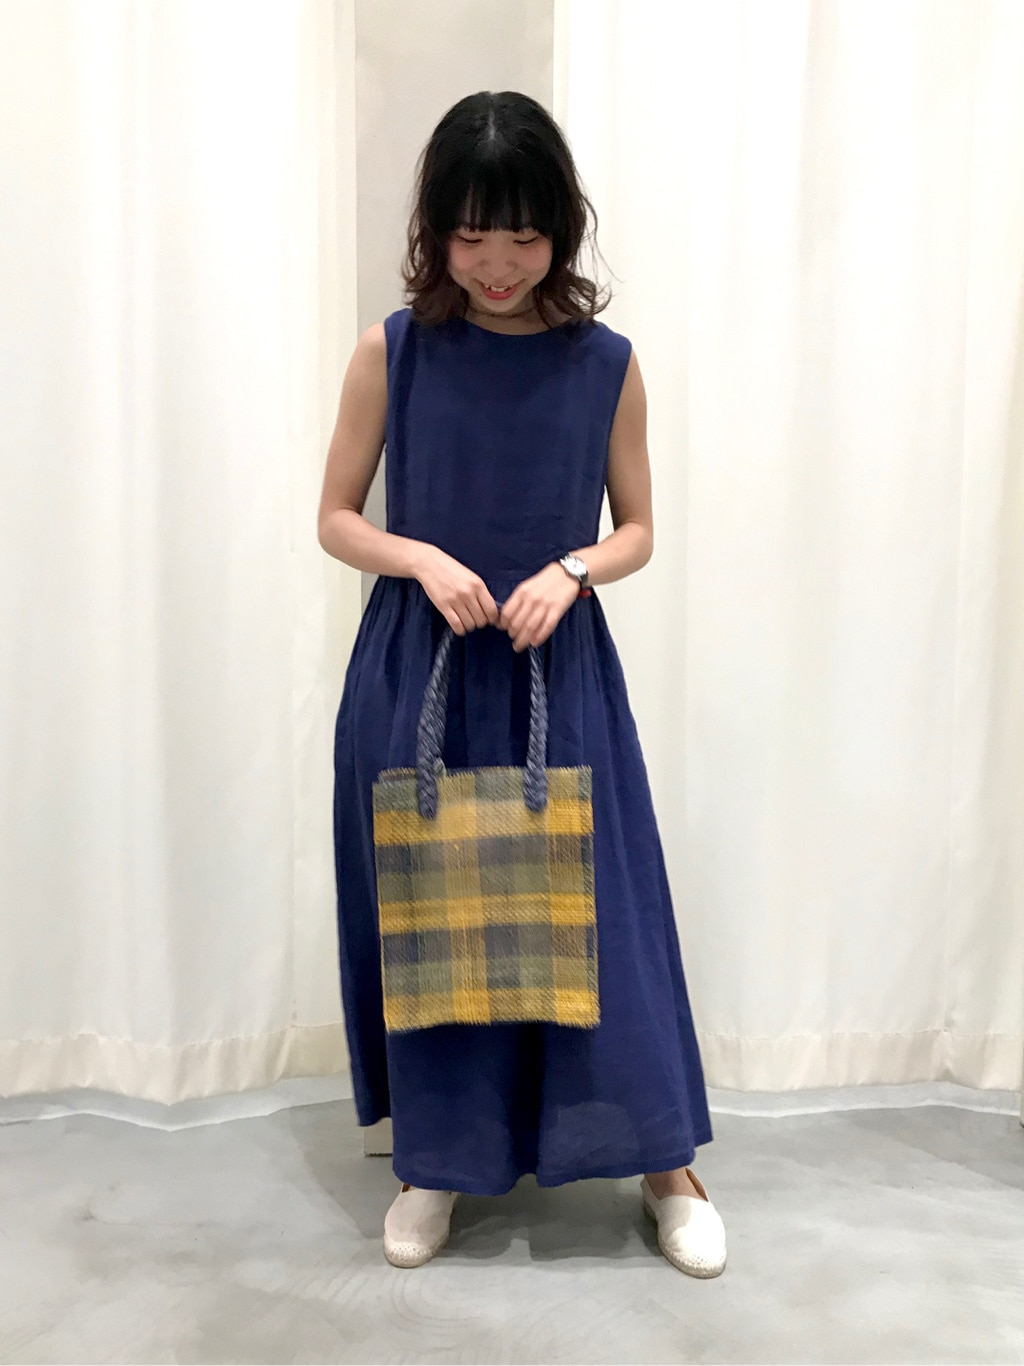 CHILD WOMAN , PAR ICI 東京スカイツリータウン・ソラマチ 2020.06.25